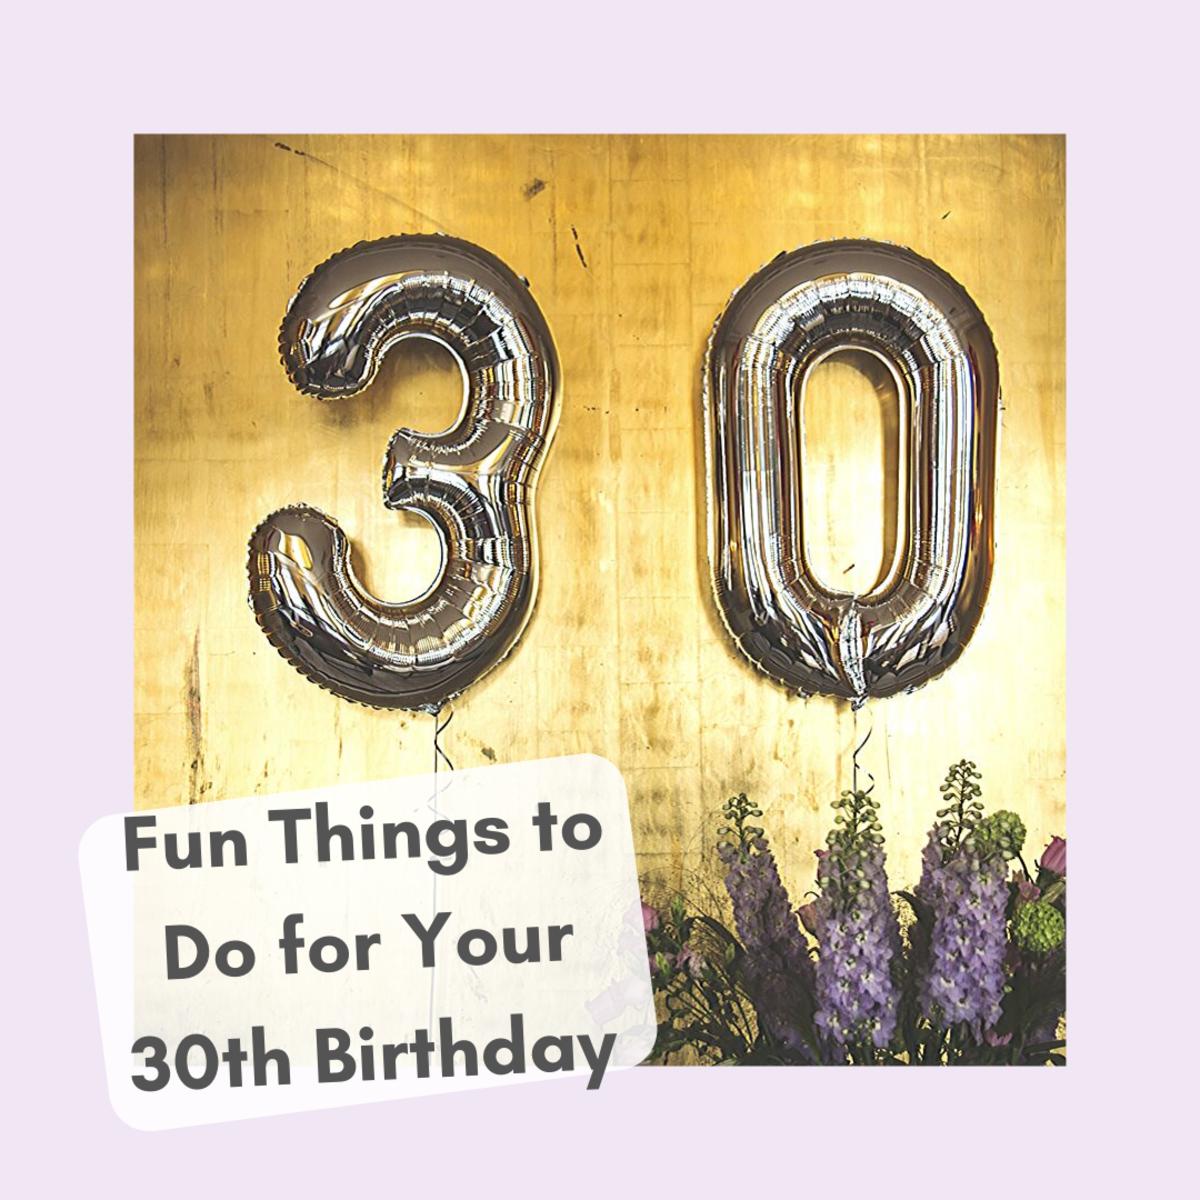 30 Fun Ways to Celebrate Your 30th Birthday